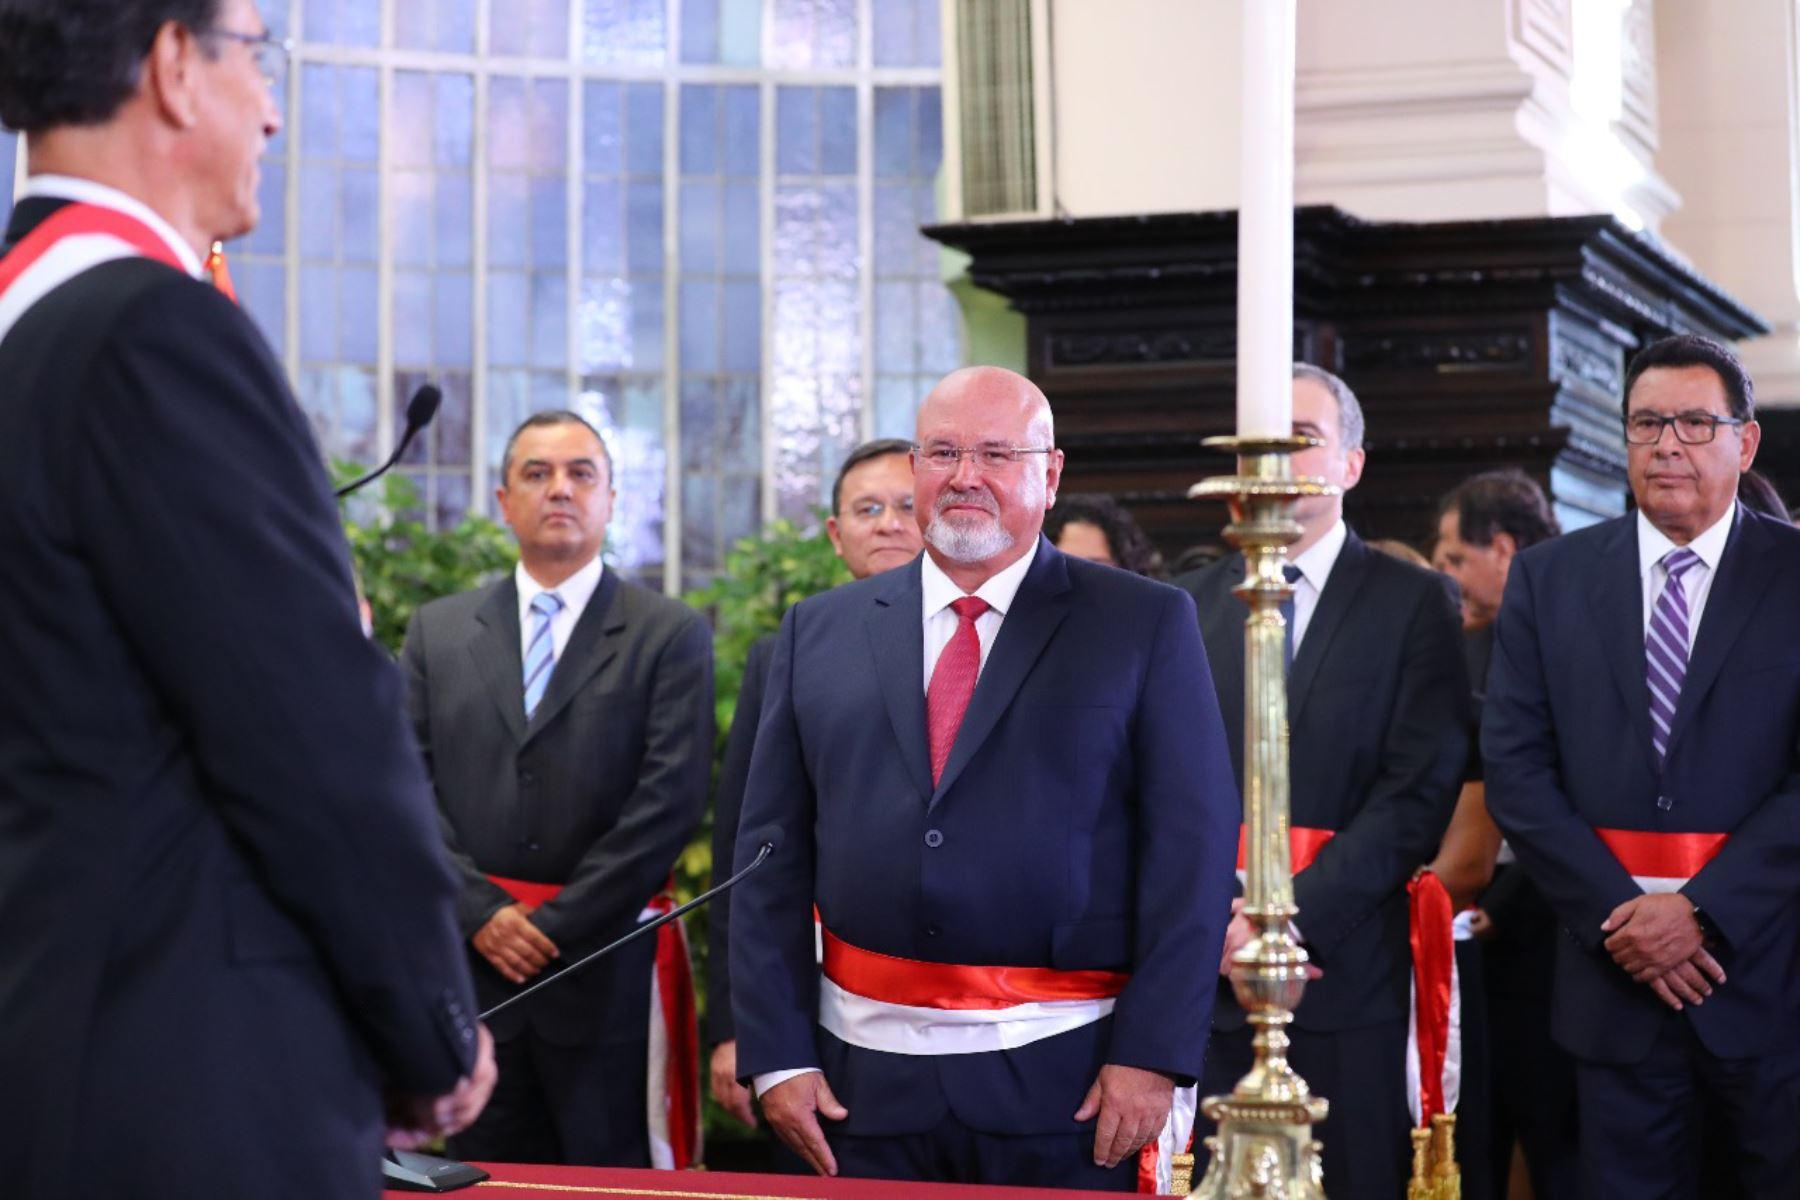 Carlos Bruce juramenta como Ministro de Vivienda. Foto: ANDINA/Prensa Presidencia